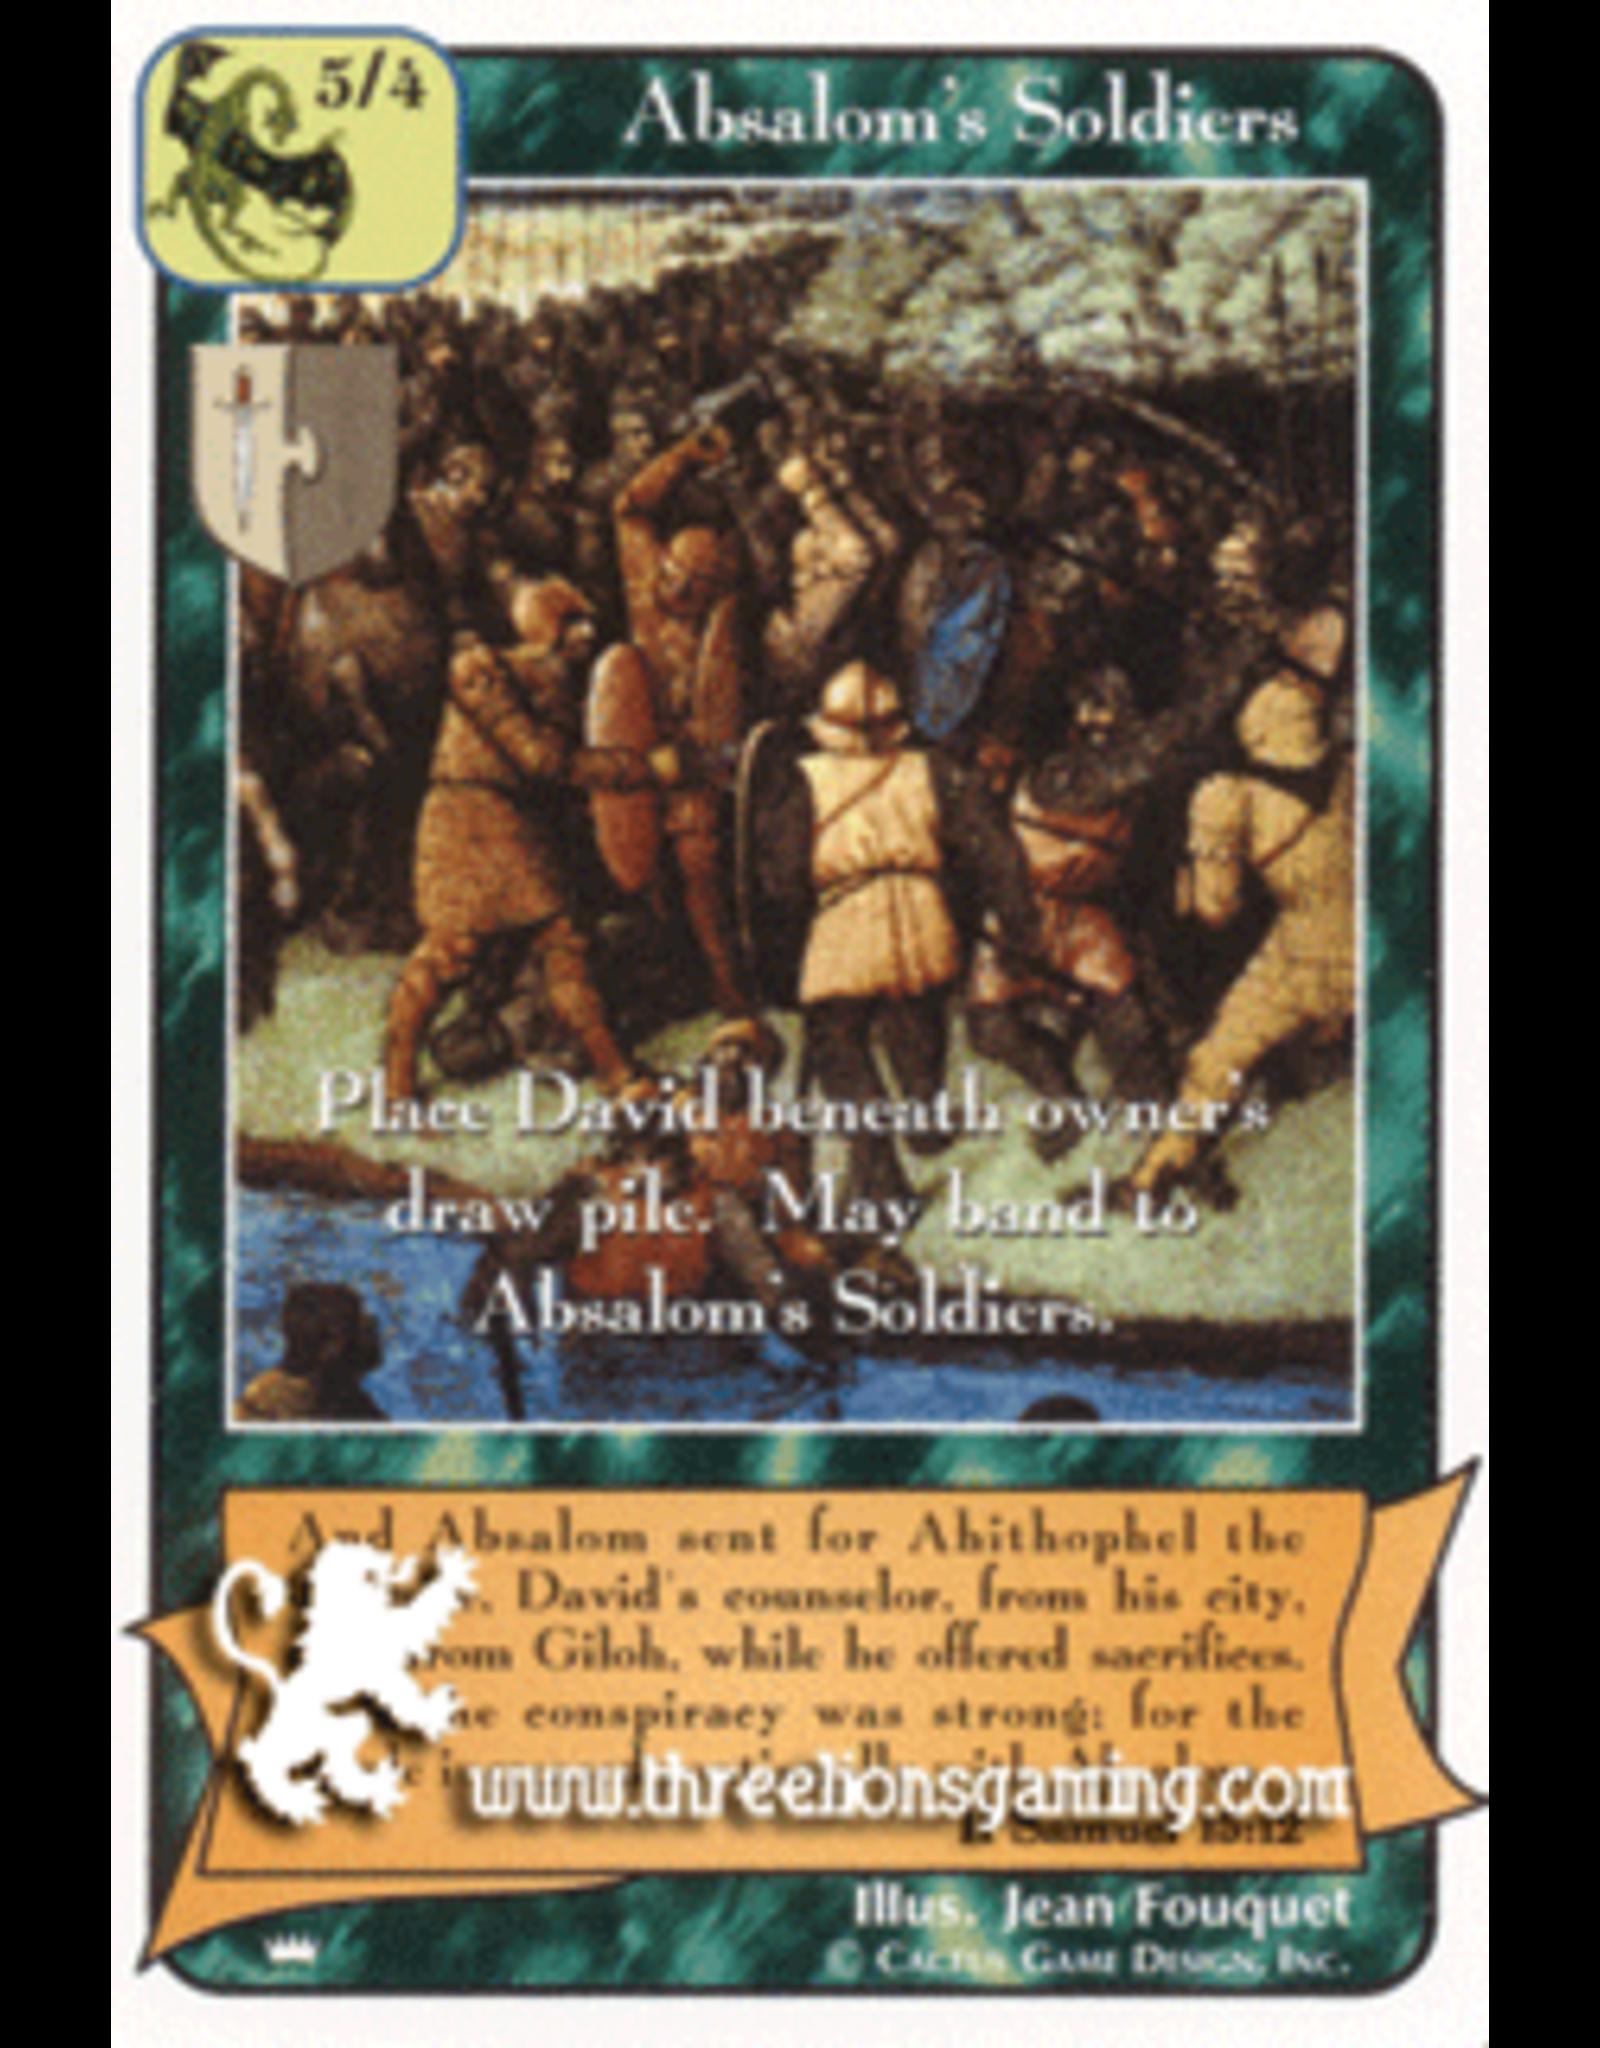 Ki: Absalom's Soldiers